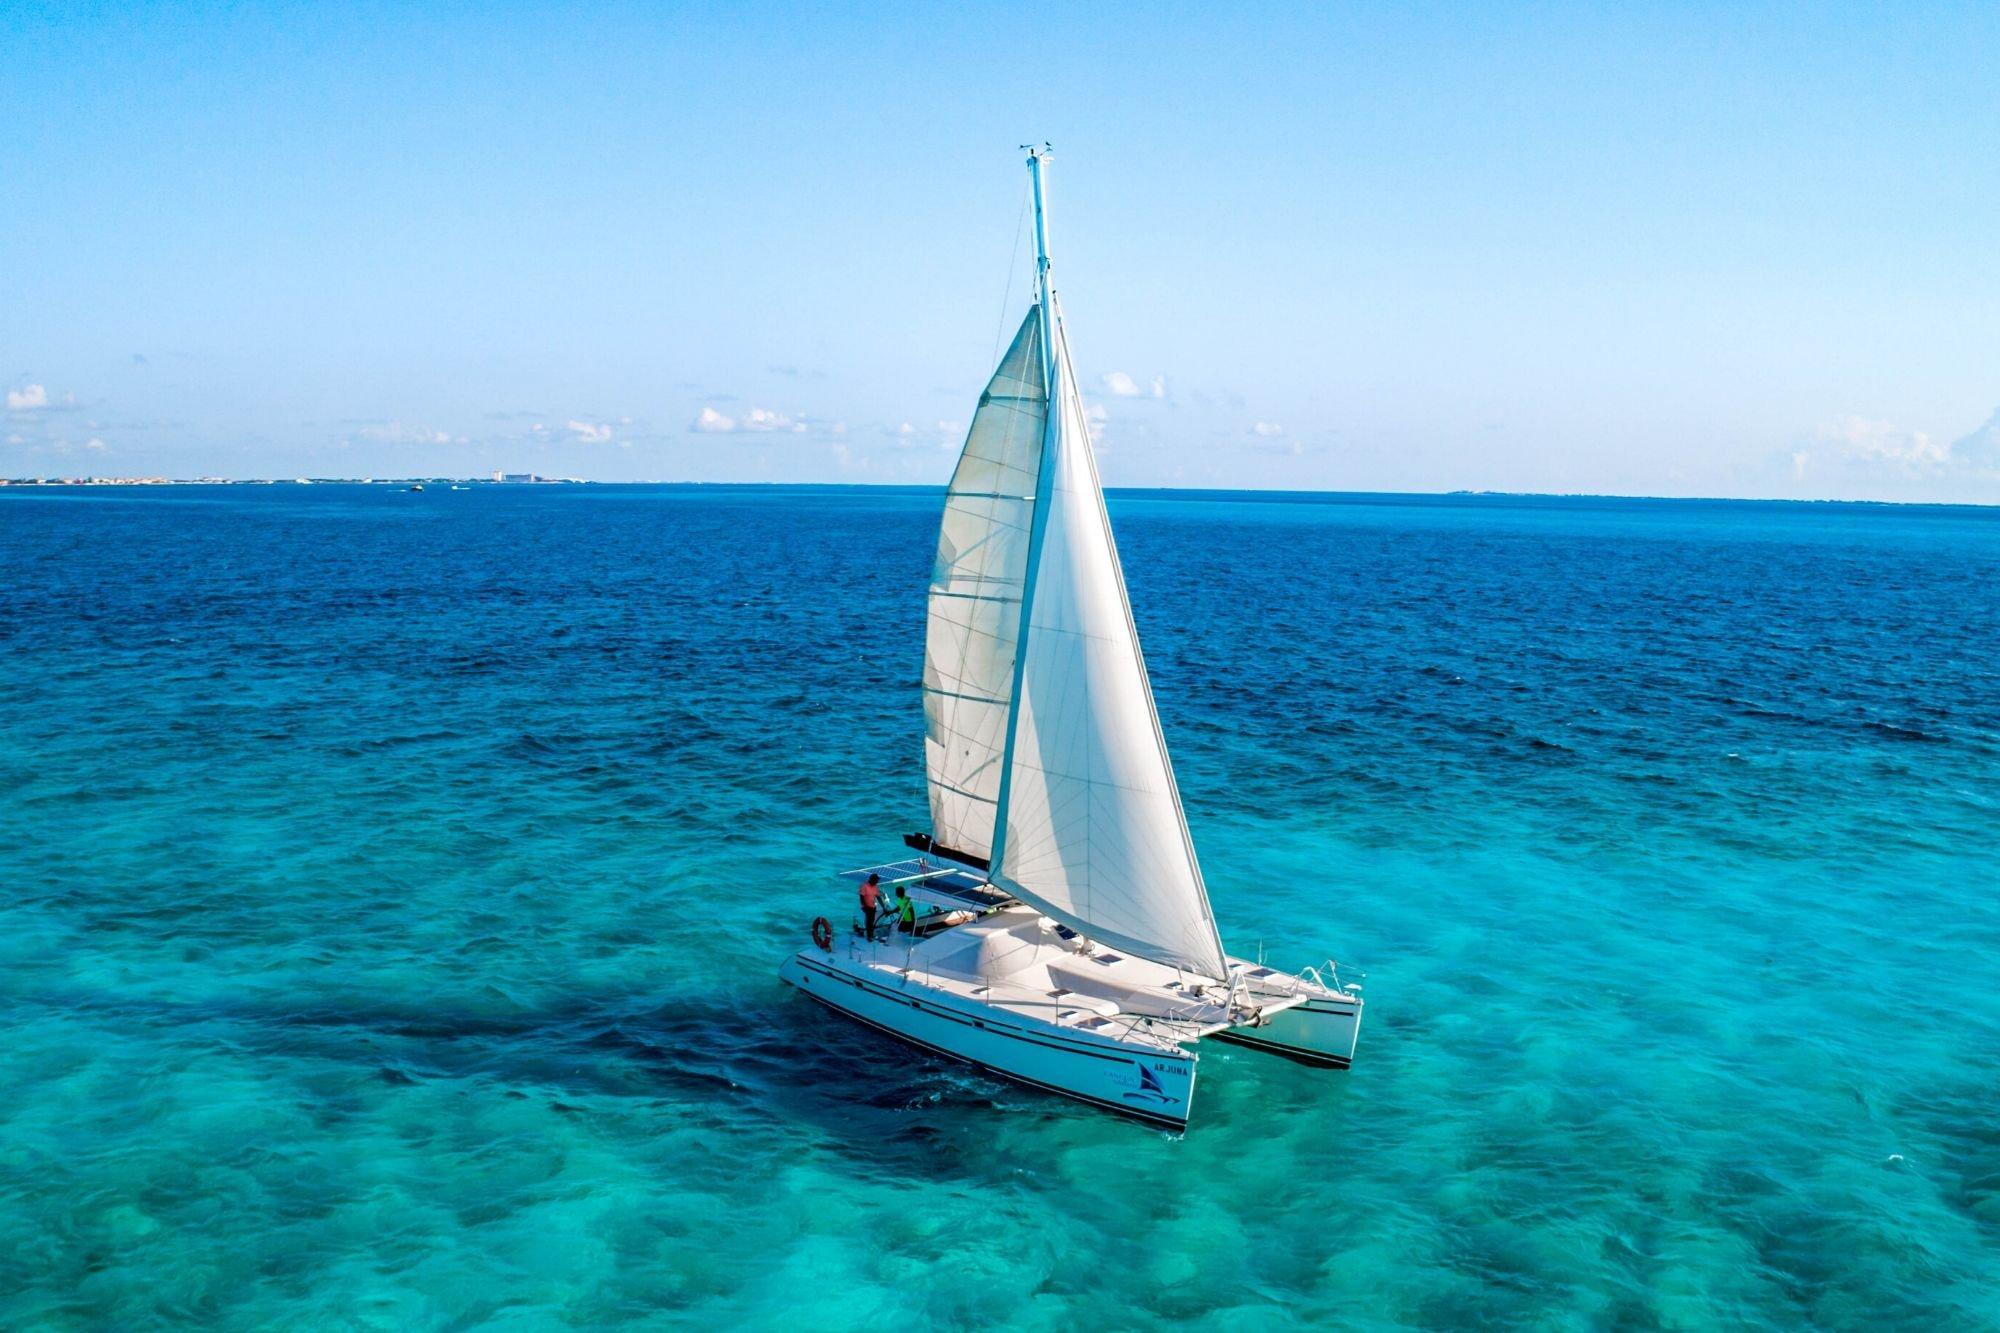 Arjuna - Isla Mujeres Catamaran Tour - Cancun Sailing - 7